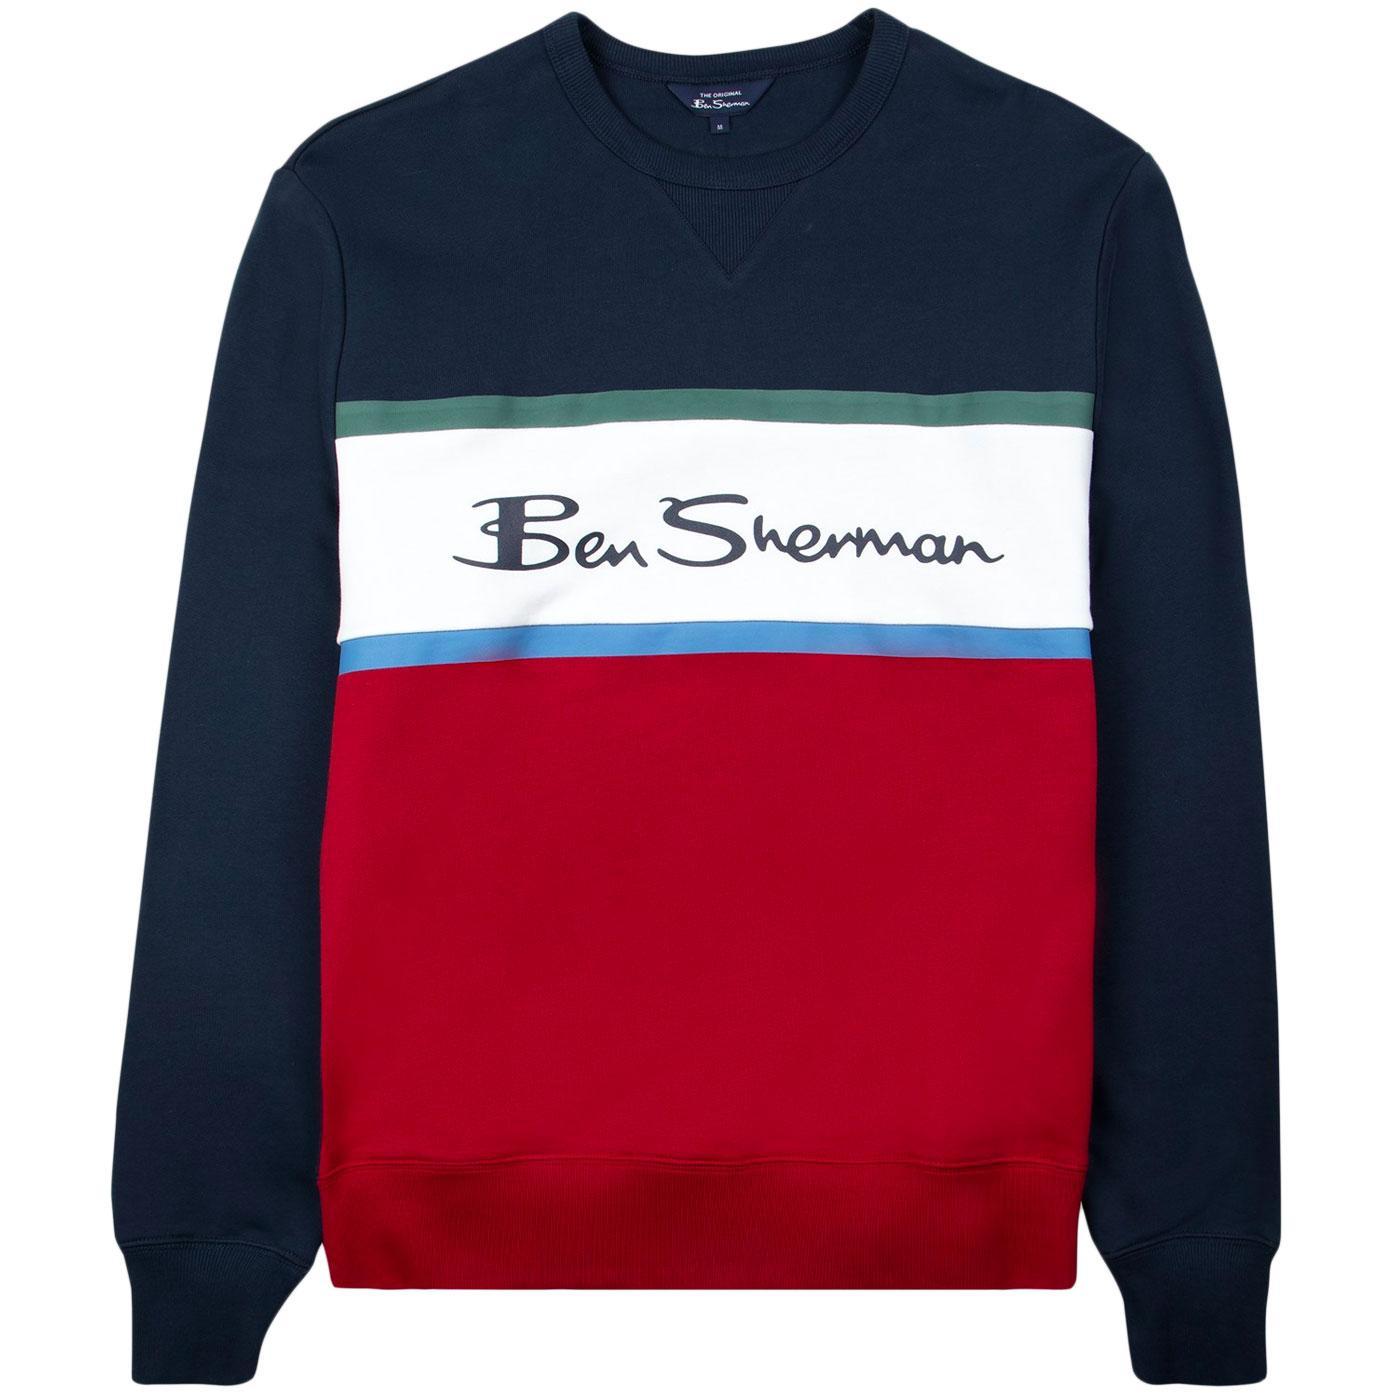 BEN SHERMAN Retro 90s Colour Block Logo Sweatshirt